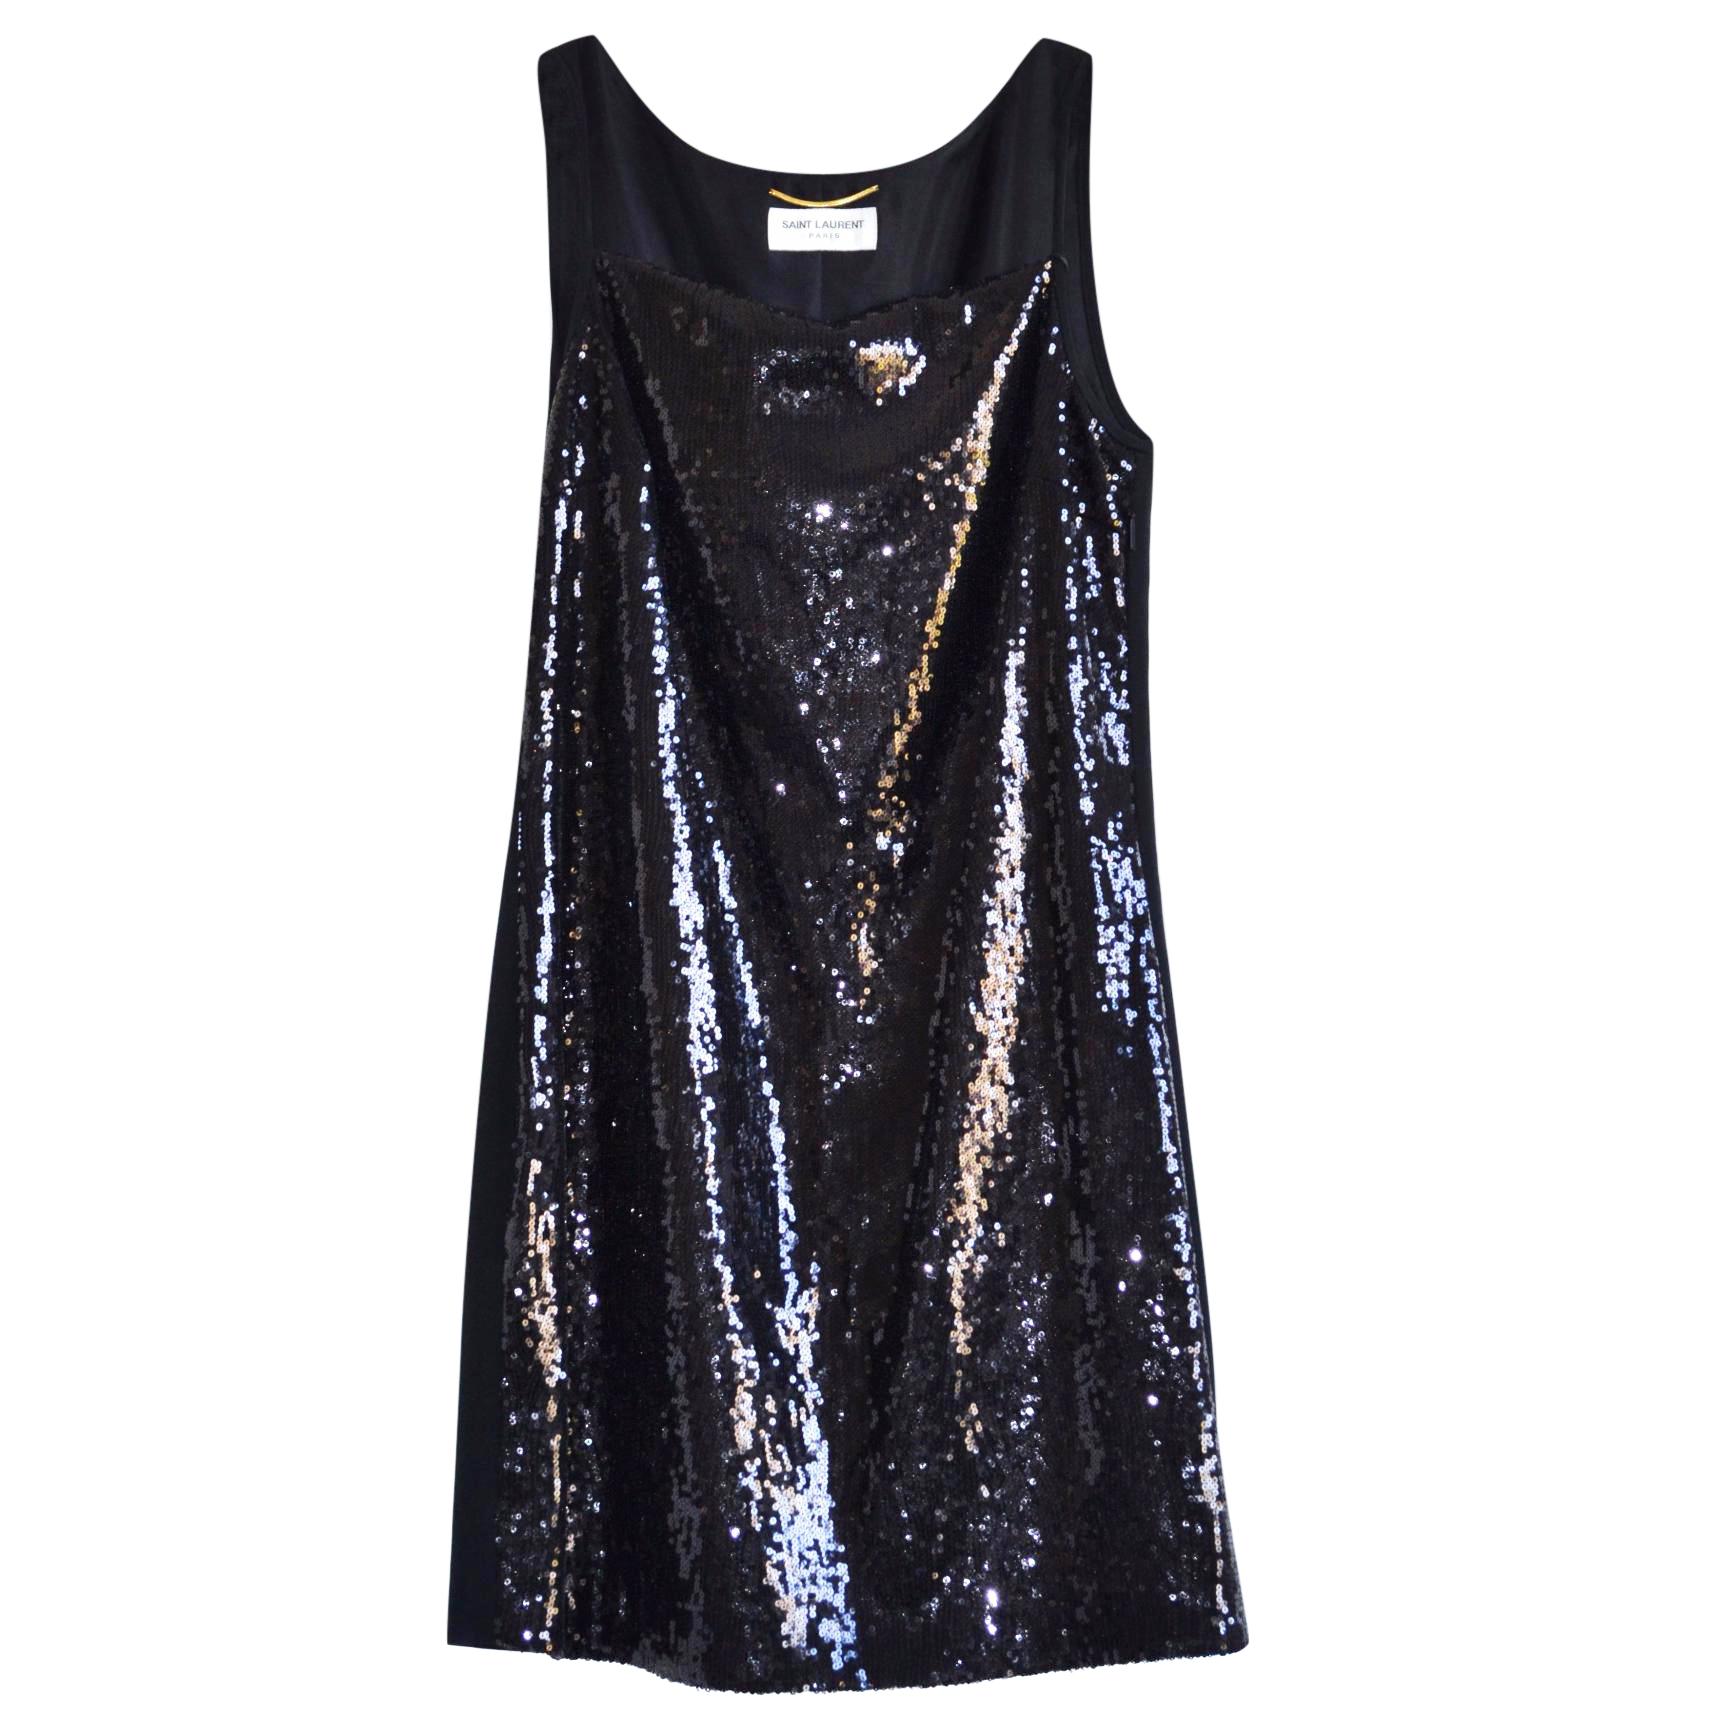 Saint Laurent black sequined mini dress